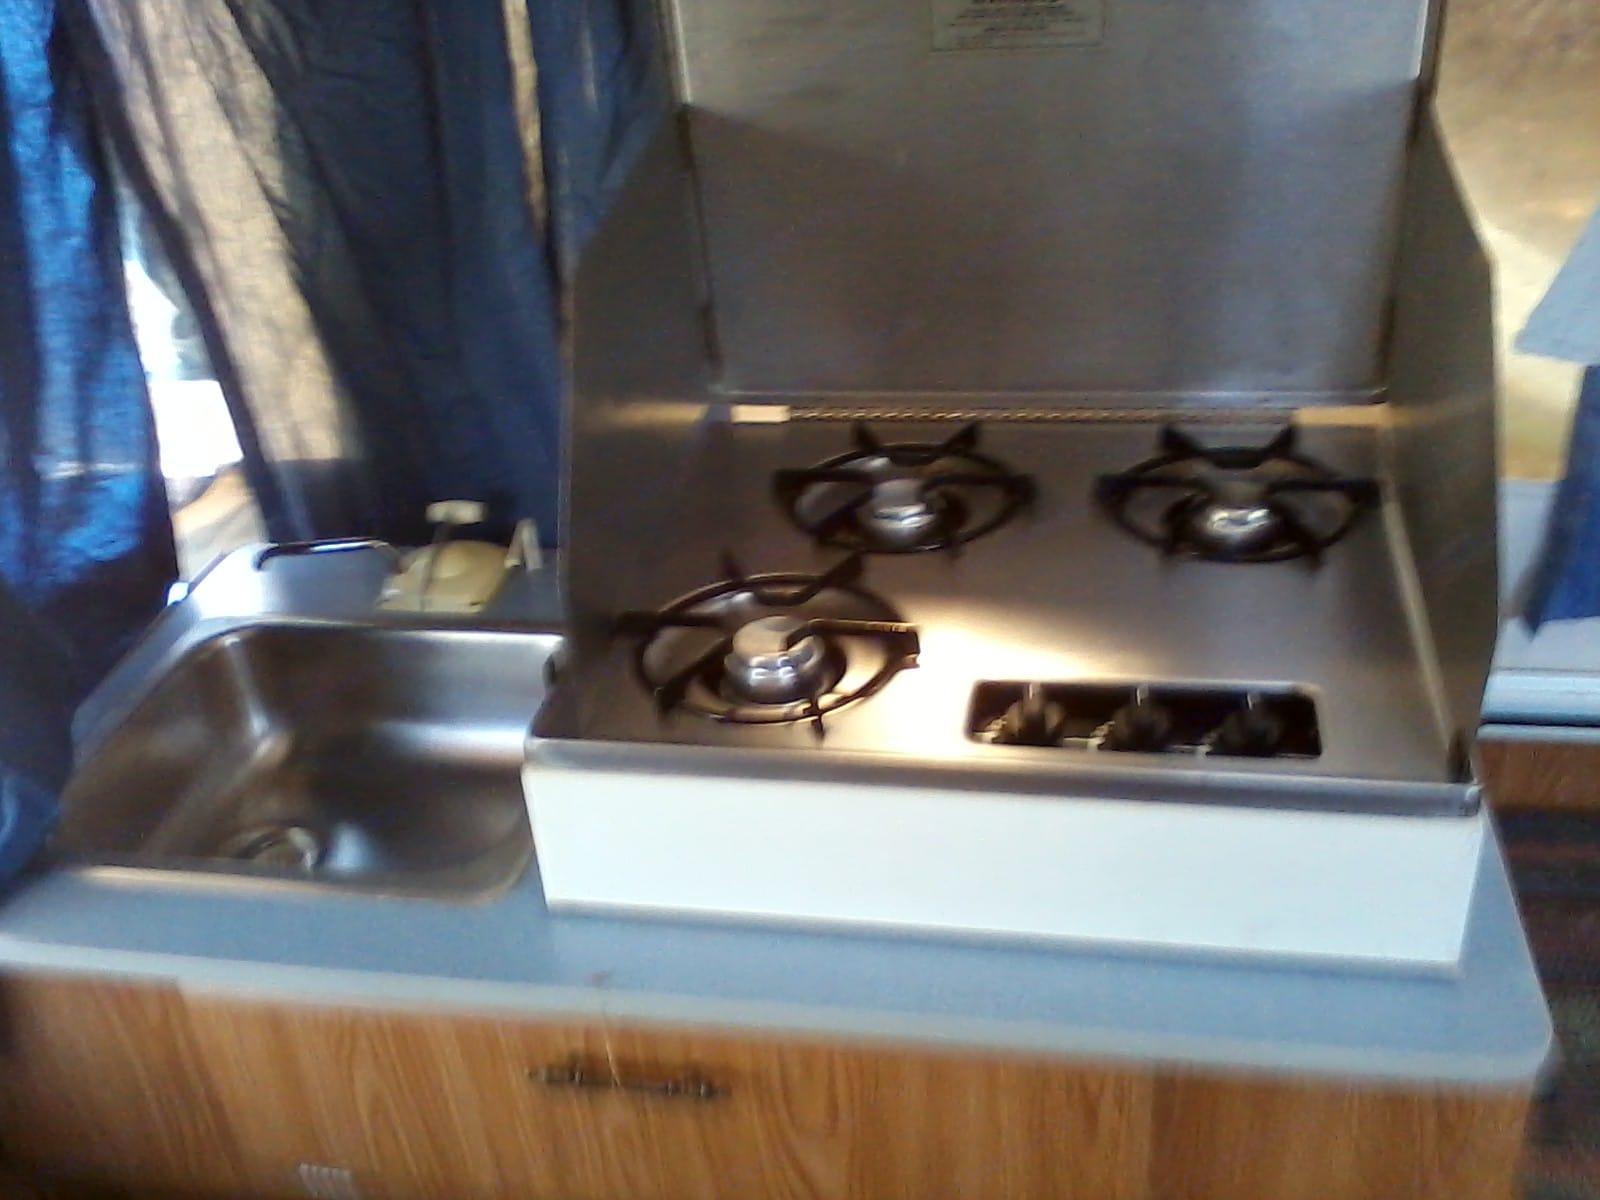 3 burner stove & Sink. Starcraft Starflyer 1994